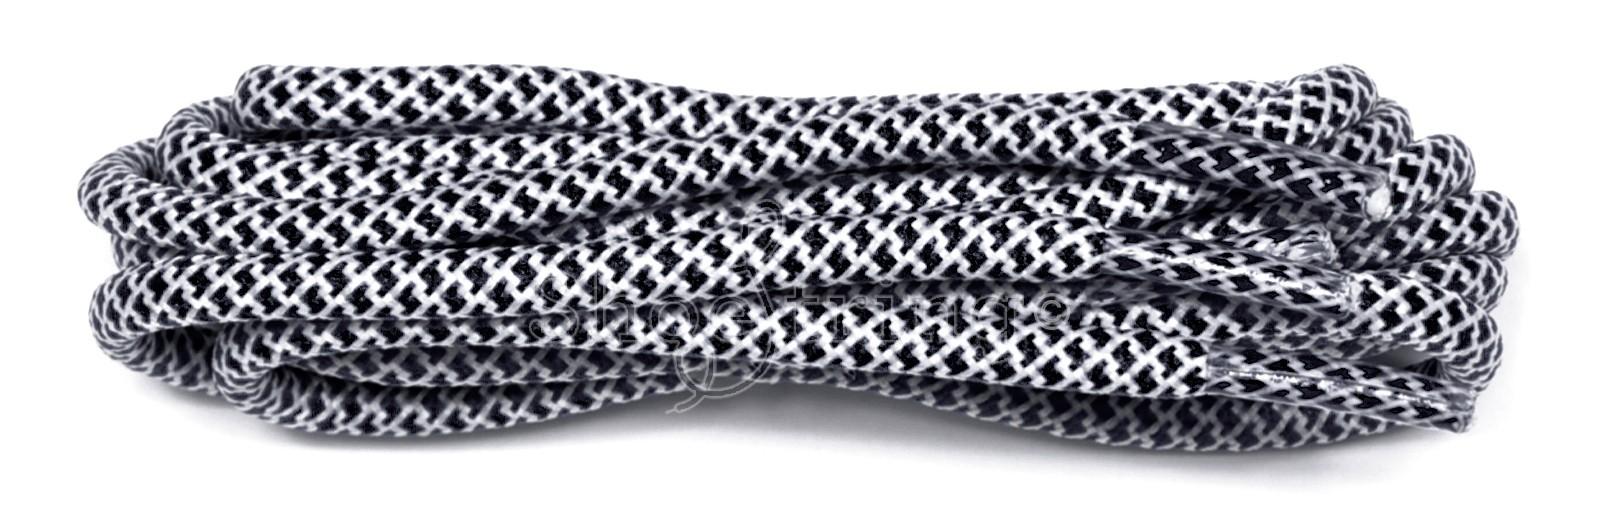 Black-white 120cm Honeycomb Rope Laces